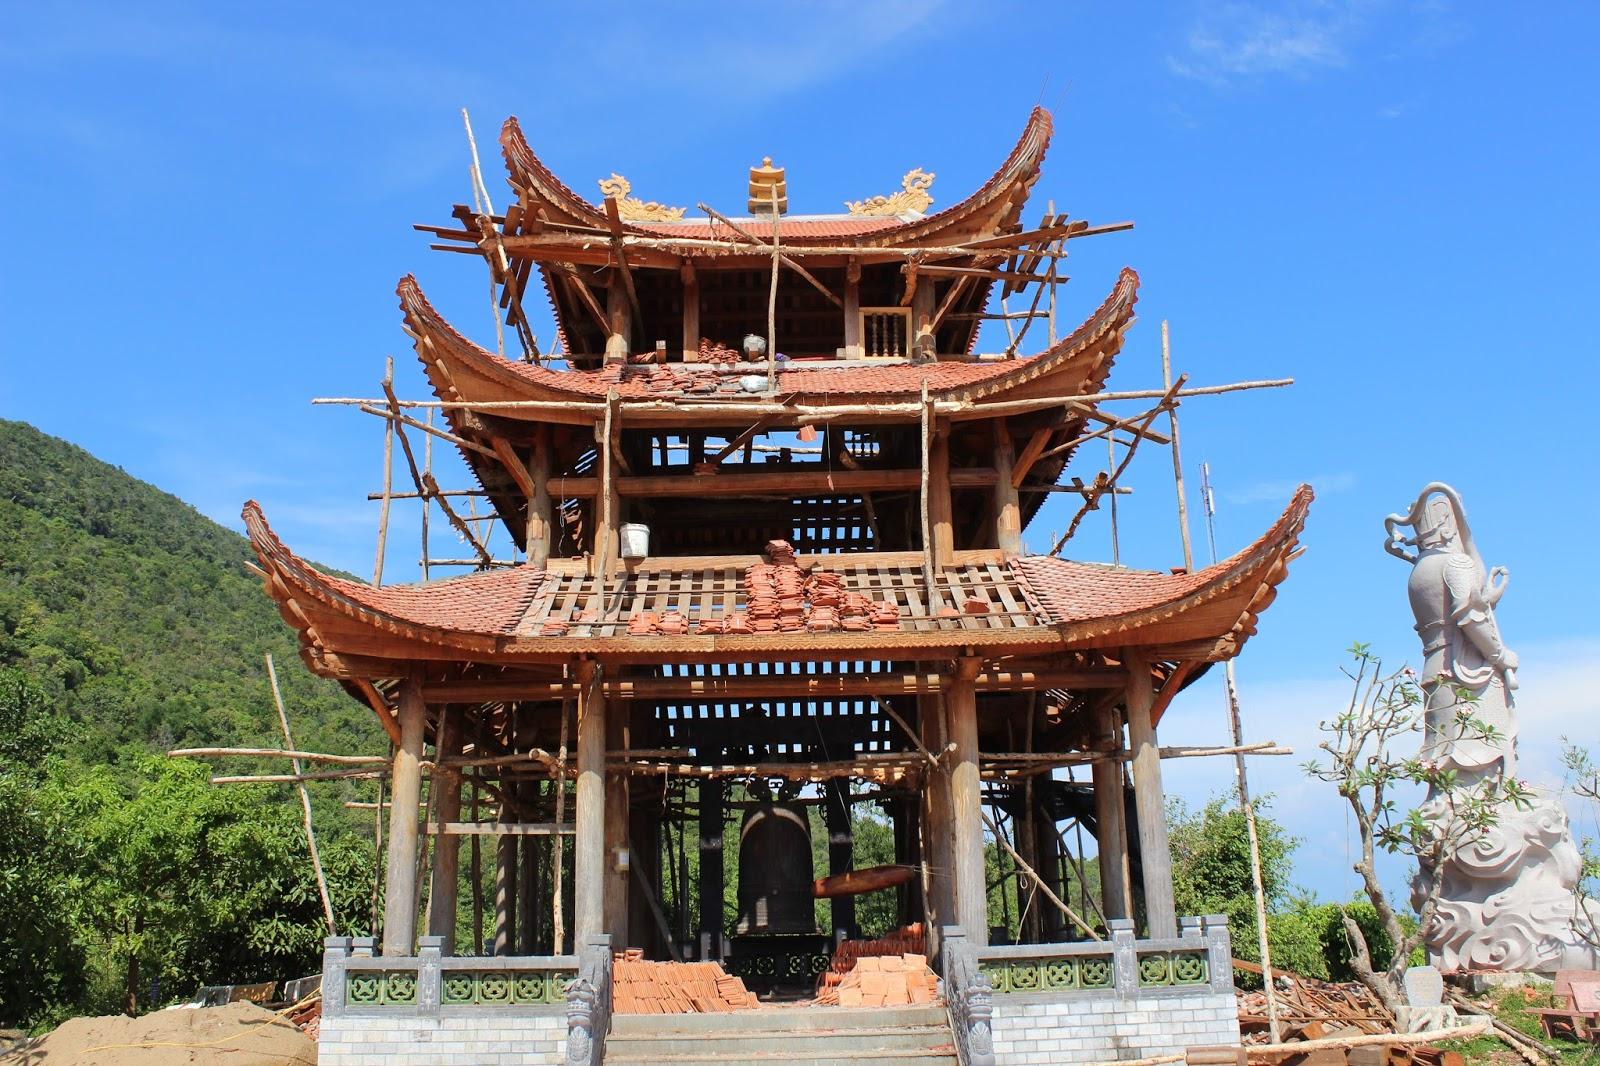 Phu Quoc pagoda